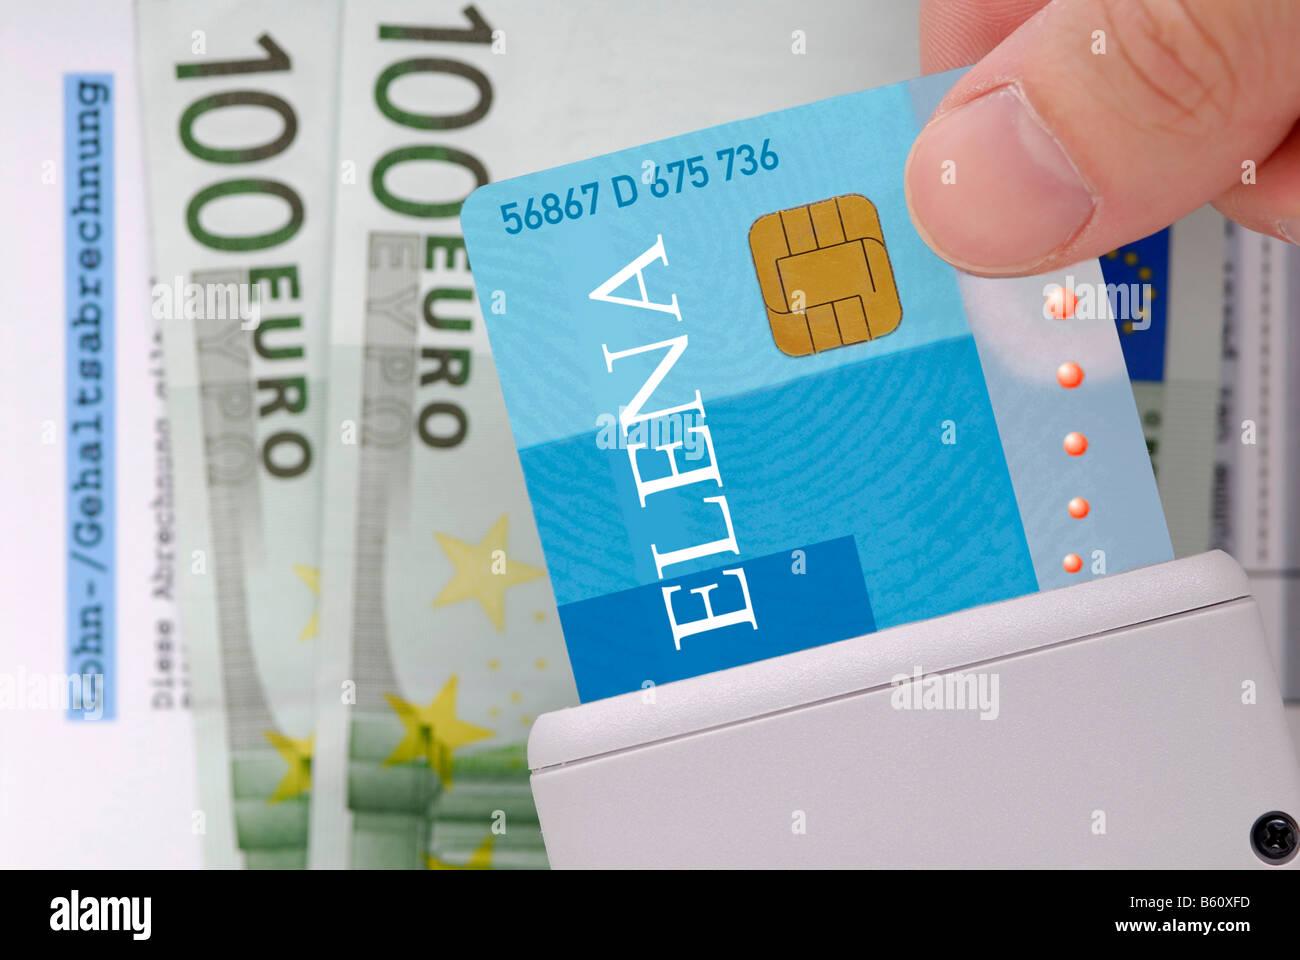 Original Bank Note Stockfotos & Original Bank Note Bilder - Alamy